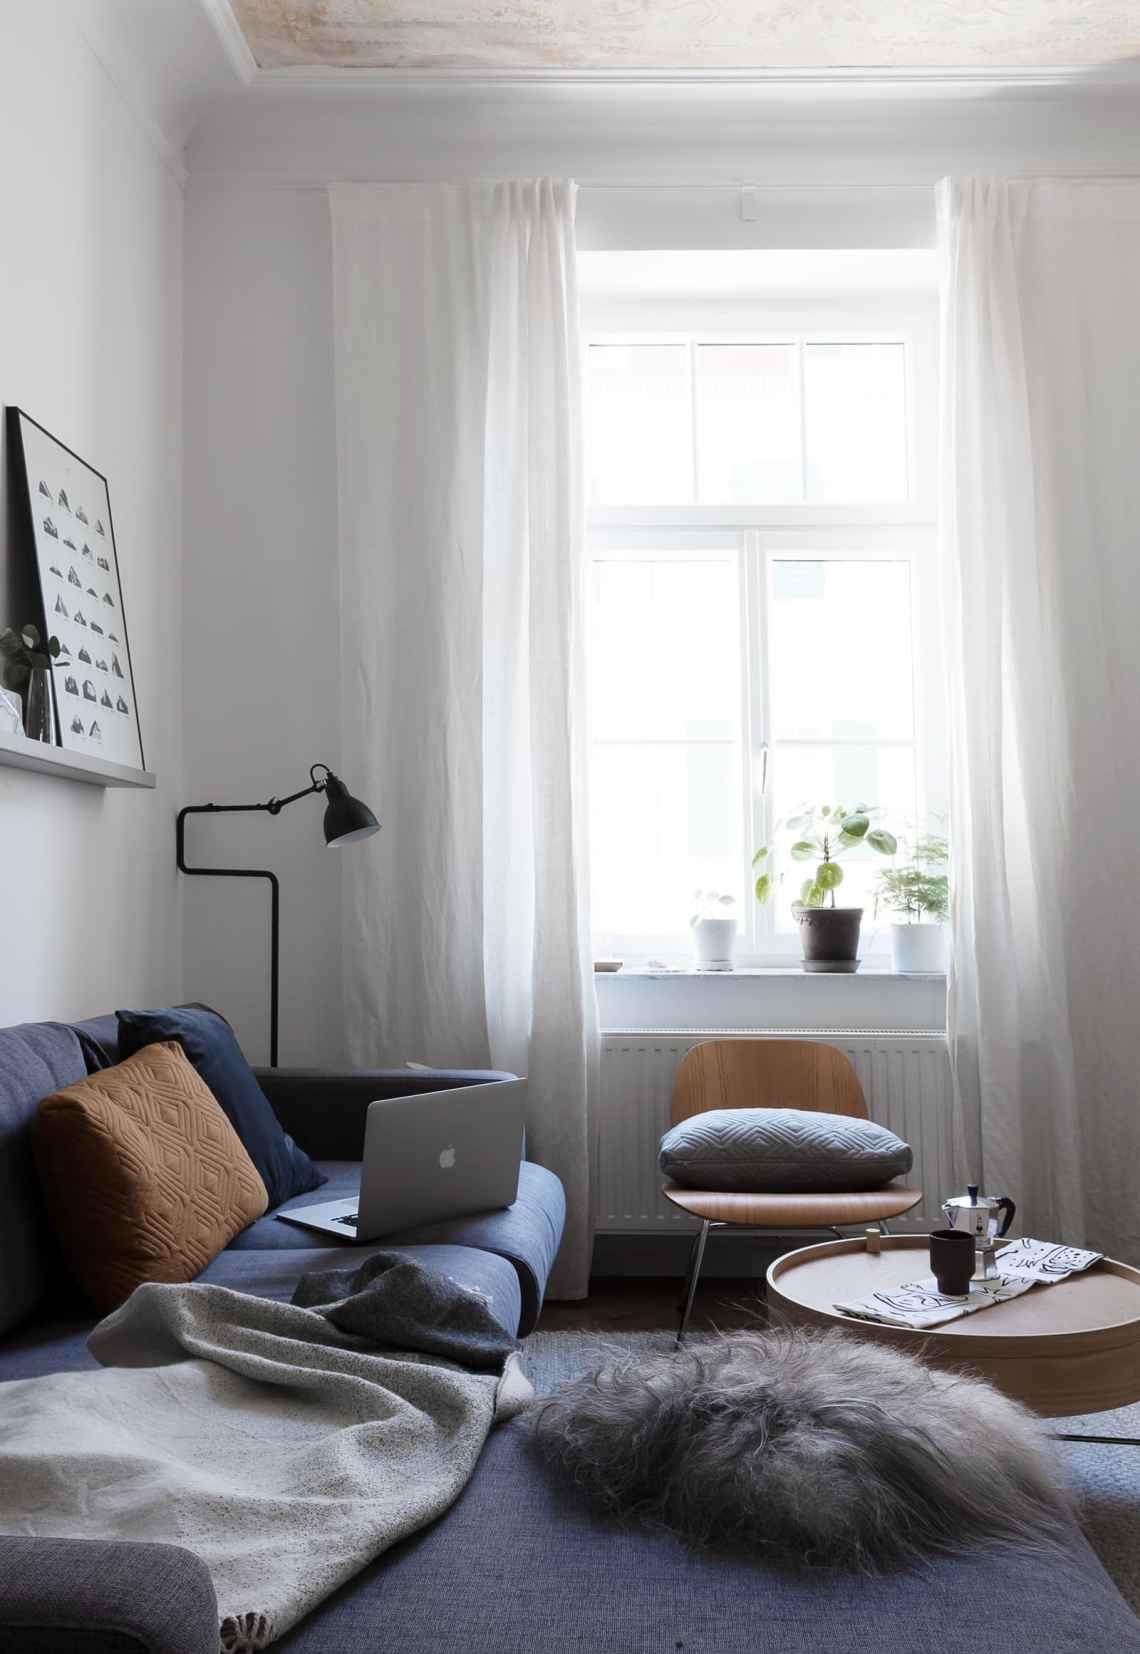 Living room stills - via Coco Lapine Design blog